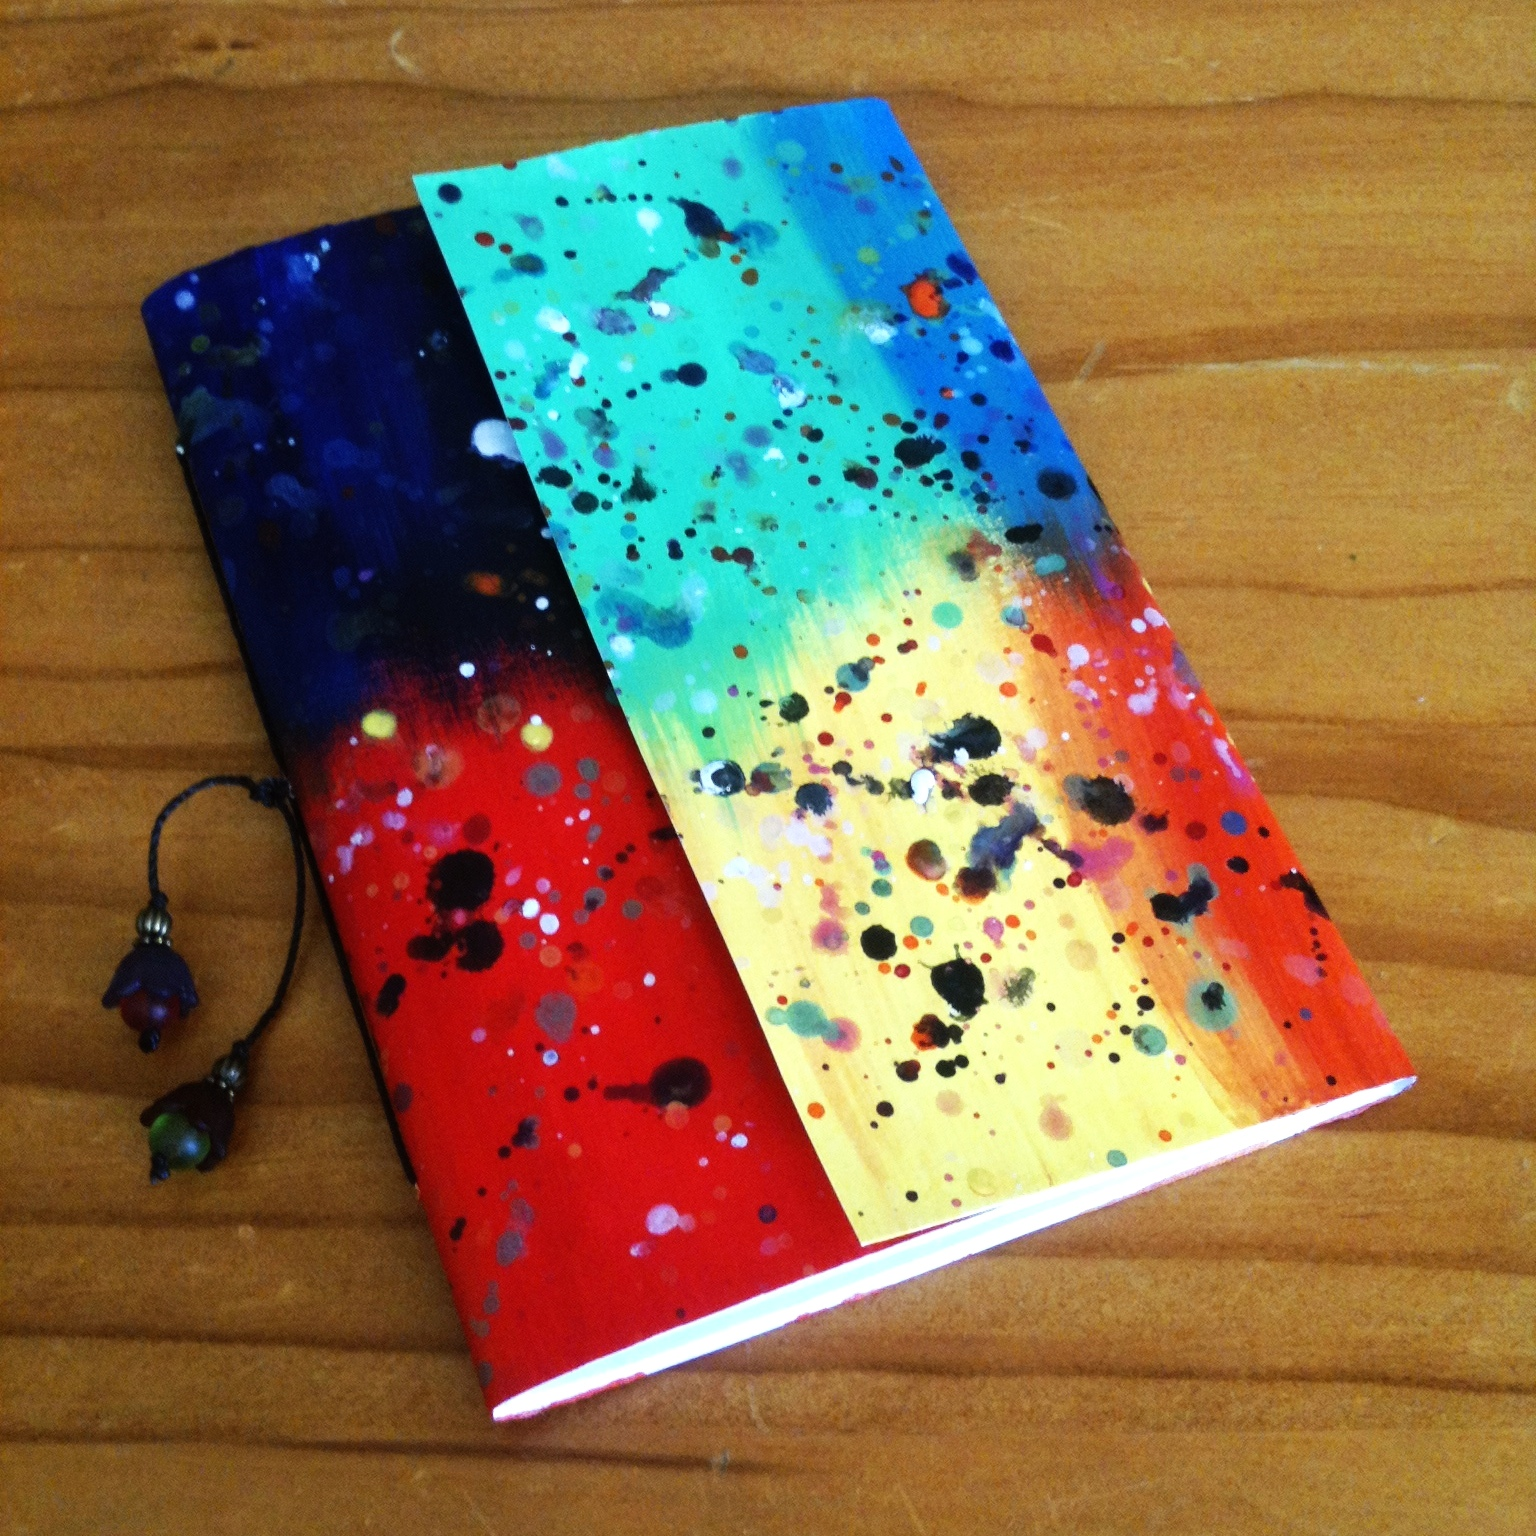 Creative Handmade Book Cover Design : Handmade book cover designs imgkid the image